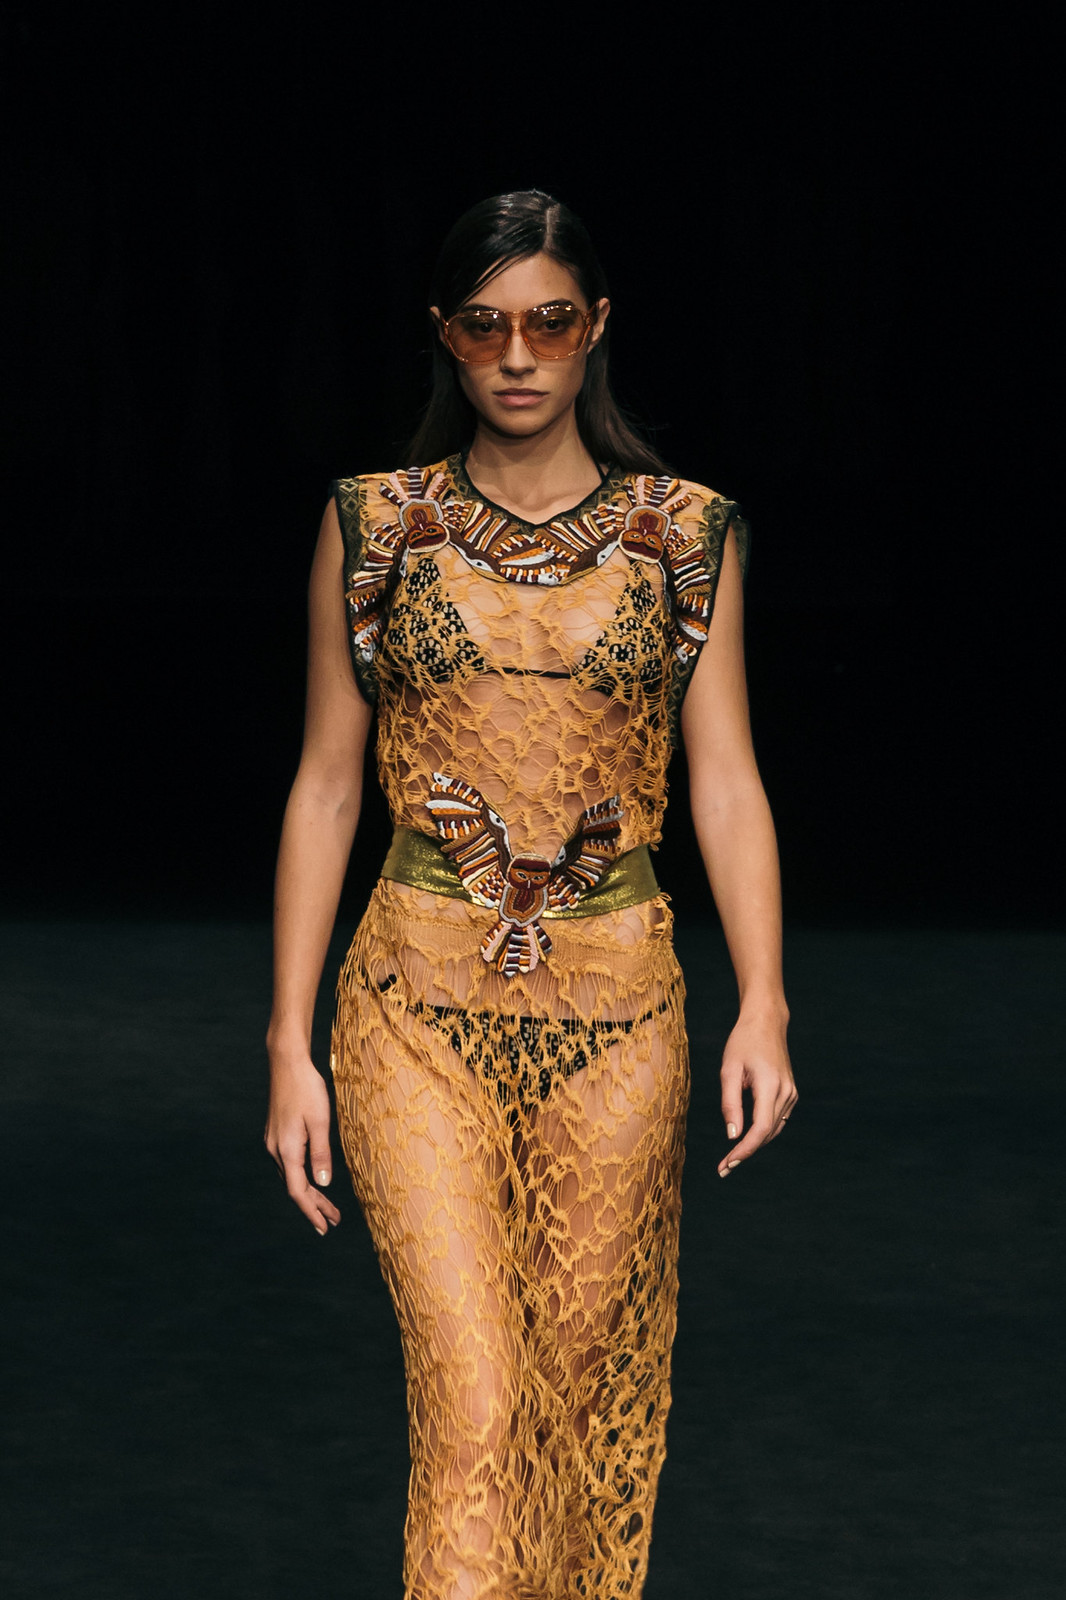 Jessie Chanes - Seams for a desire - 080 Bacelona Fashion #080bcnfasion -13